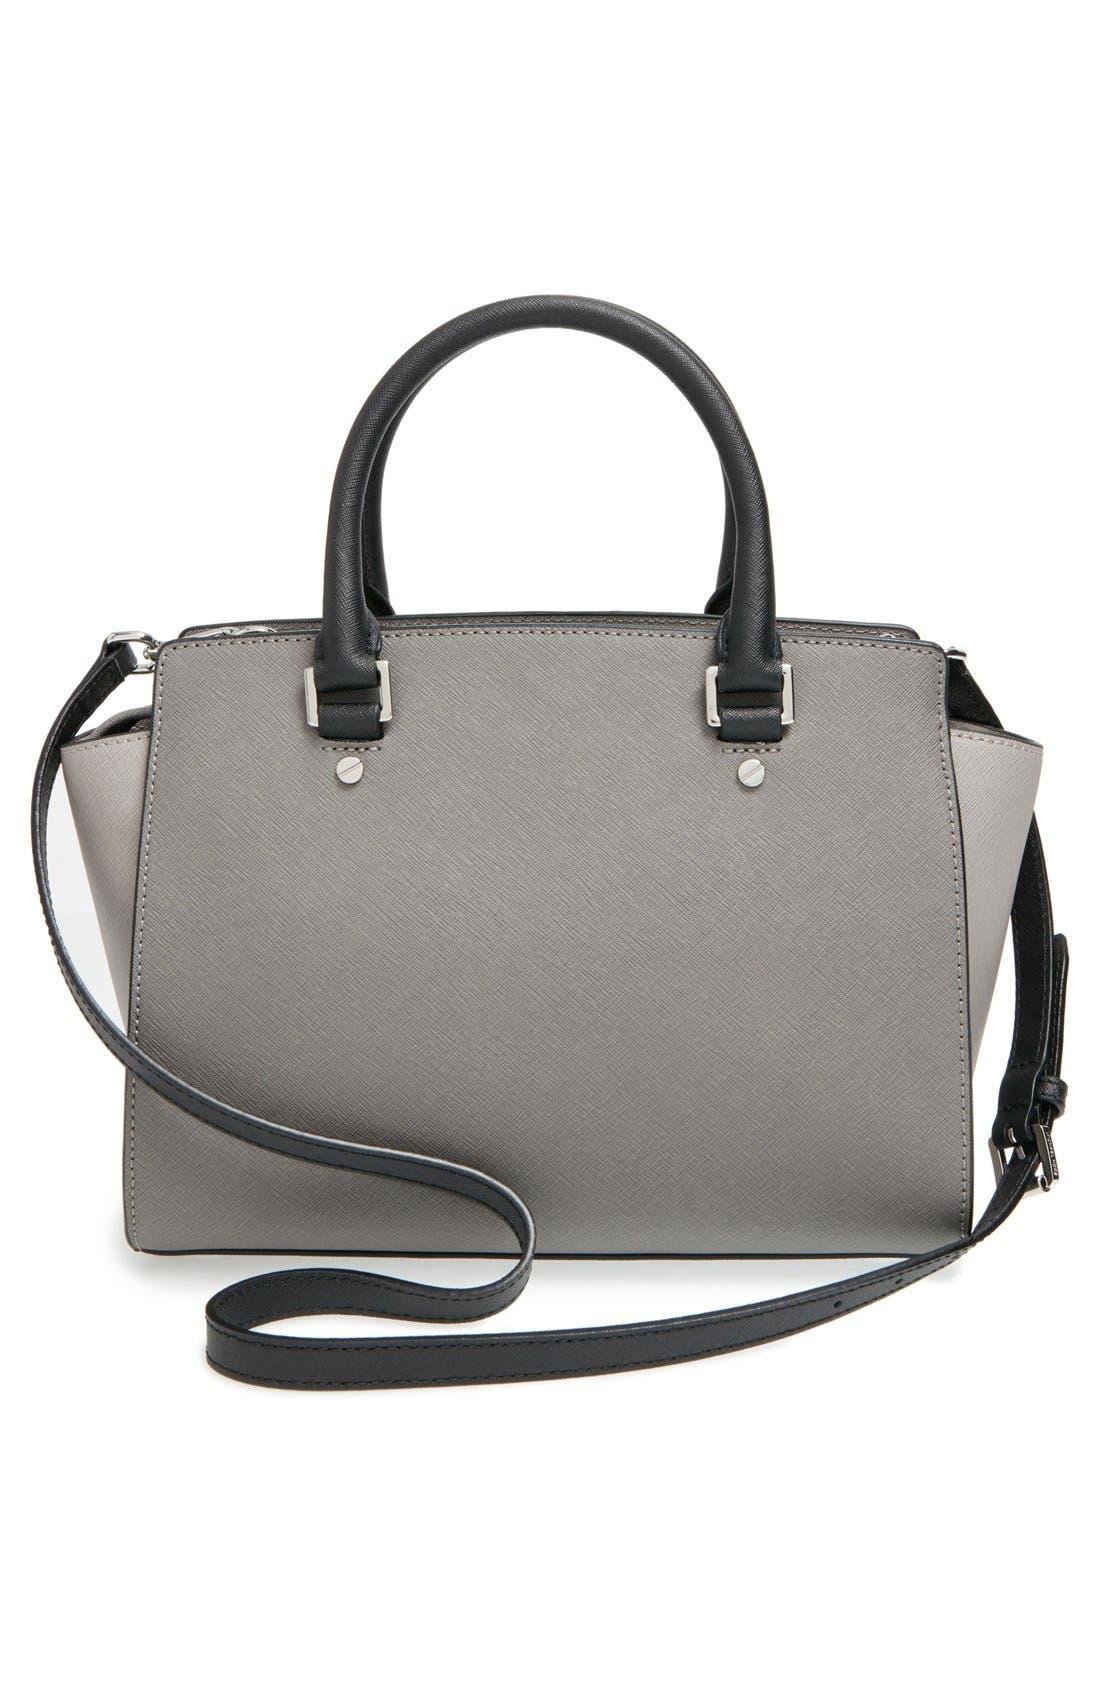 Alternate Image 3  - MICHAEL Michael Kors 'Selma - Medium' Saffiano Leather Crossbody Bag